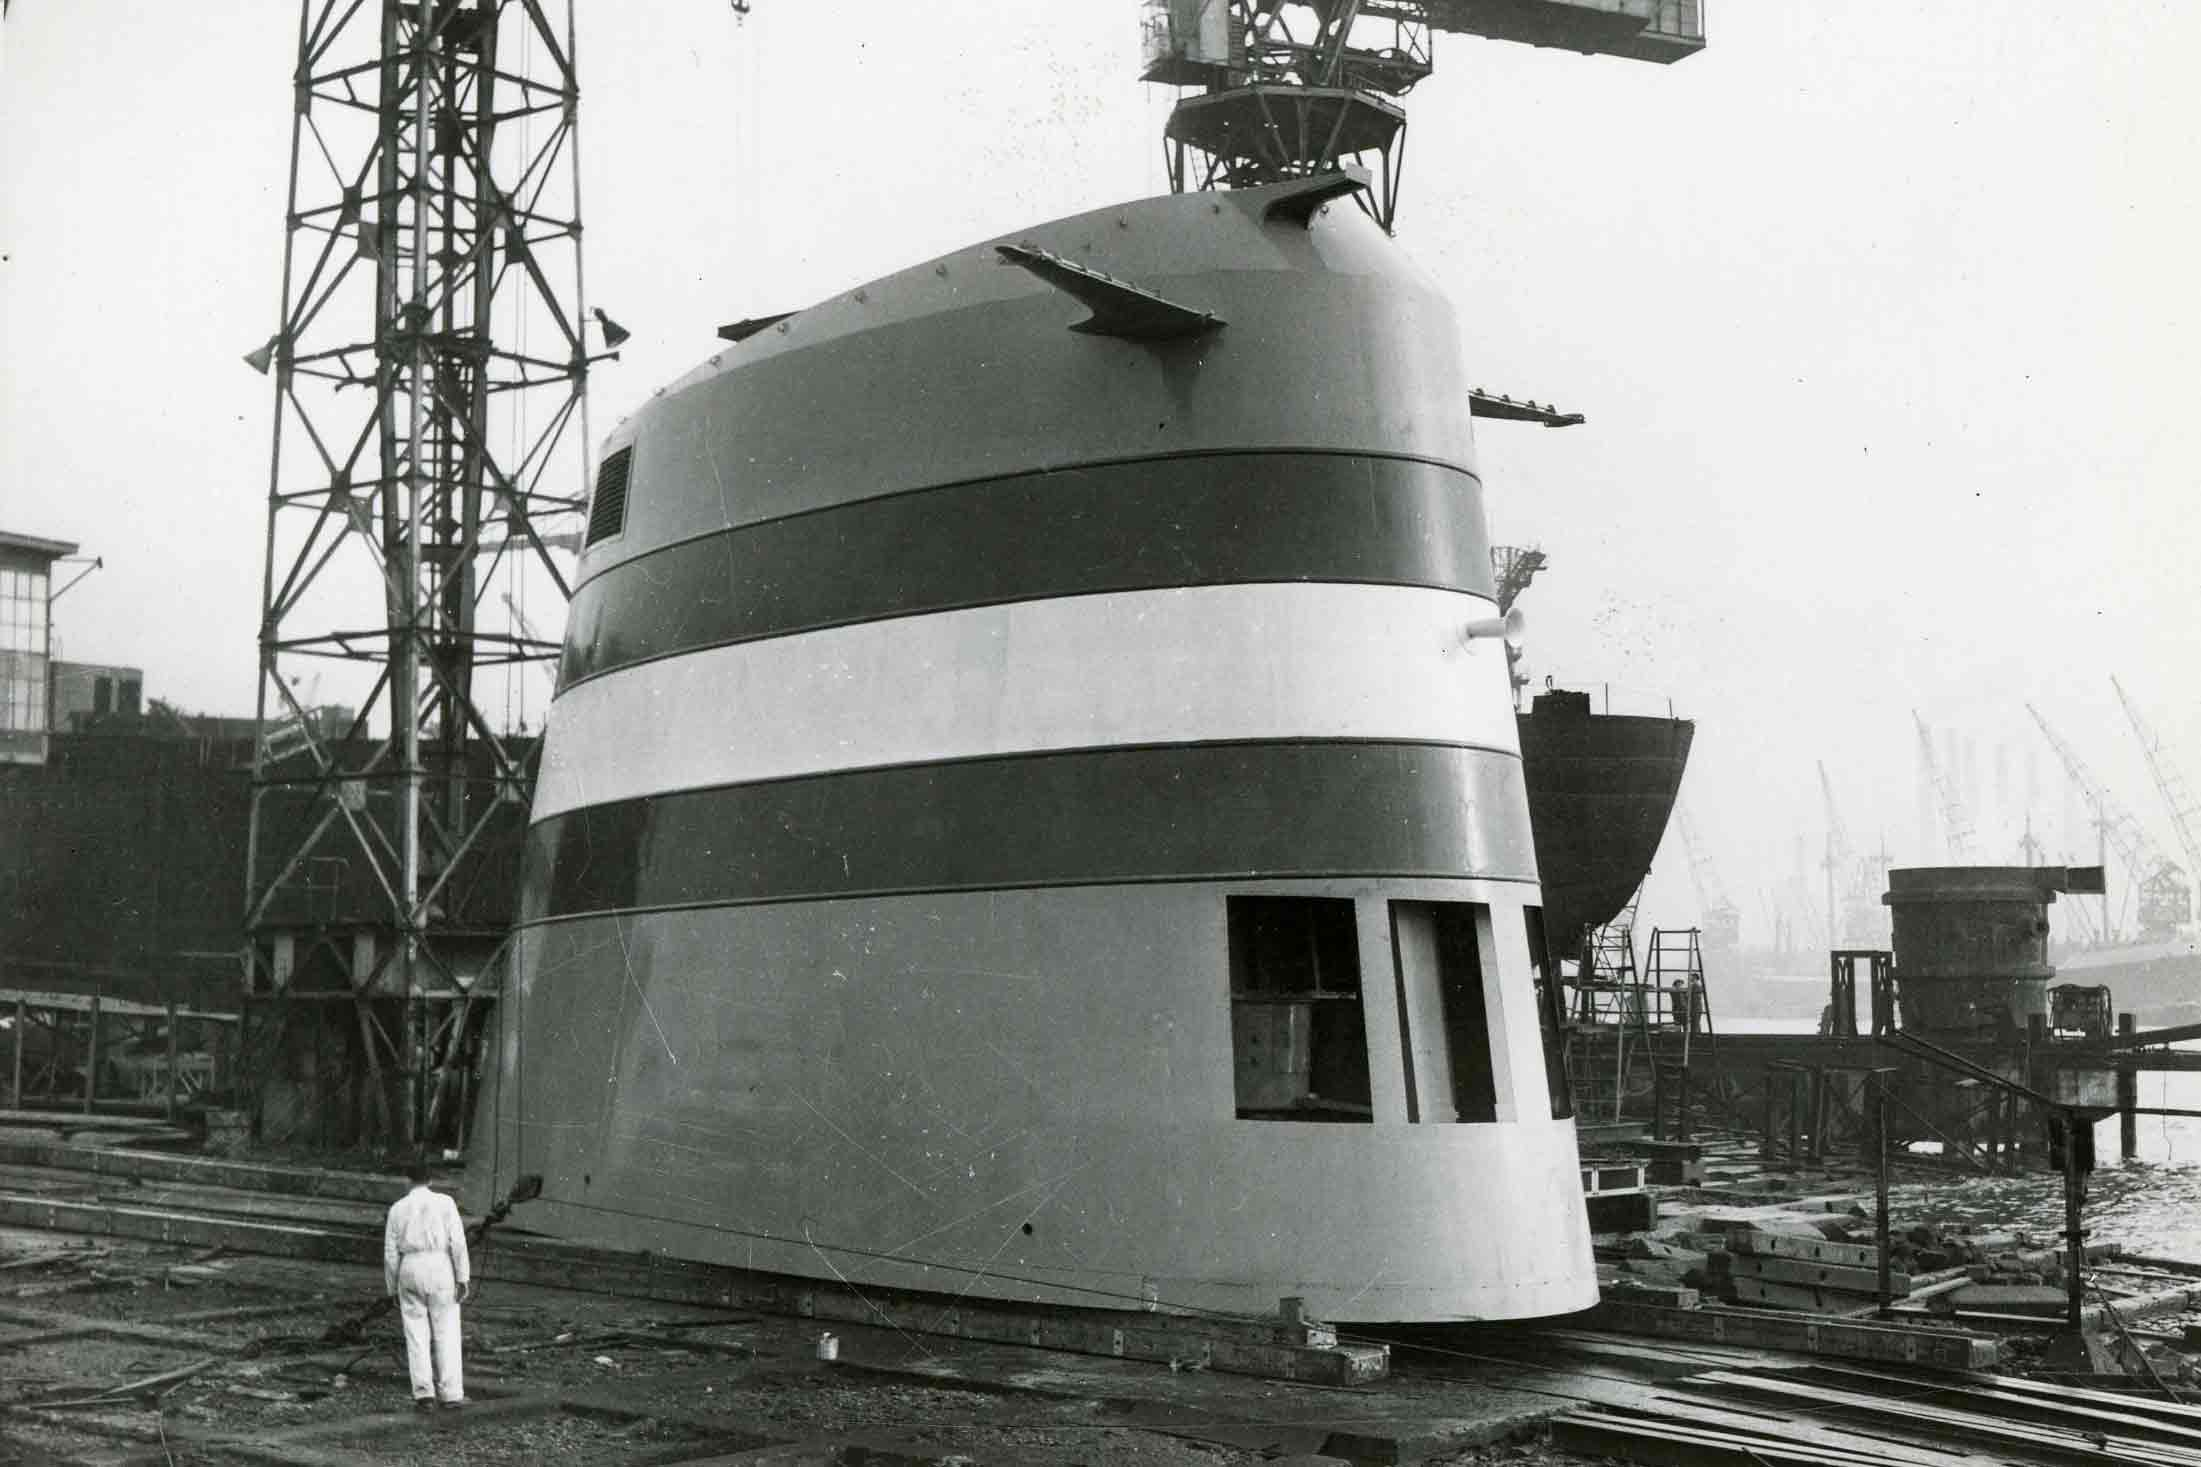 Bnr. 125: Schoorsteen ss Statendam (1956)